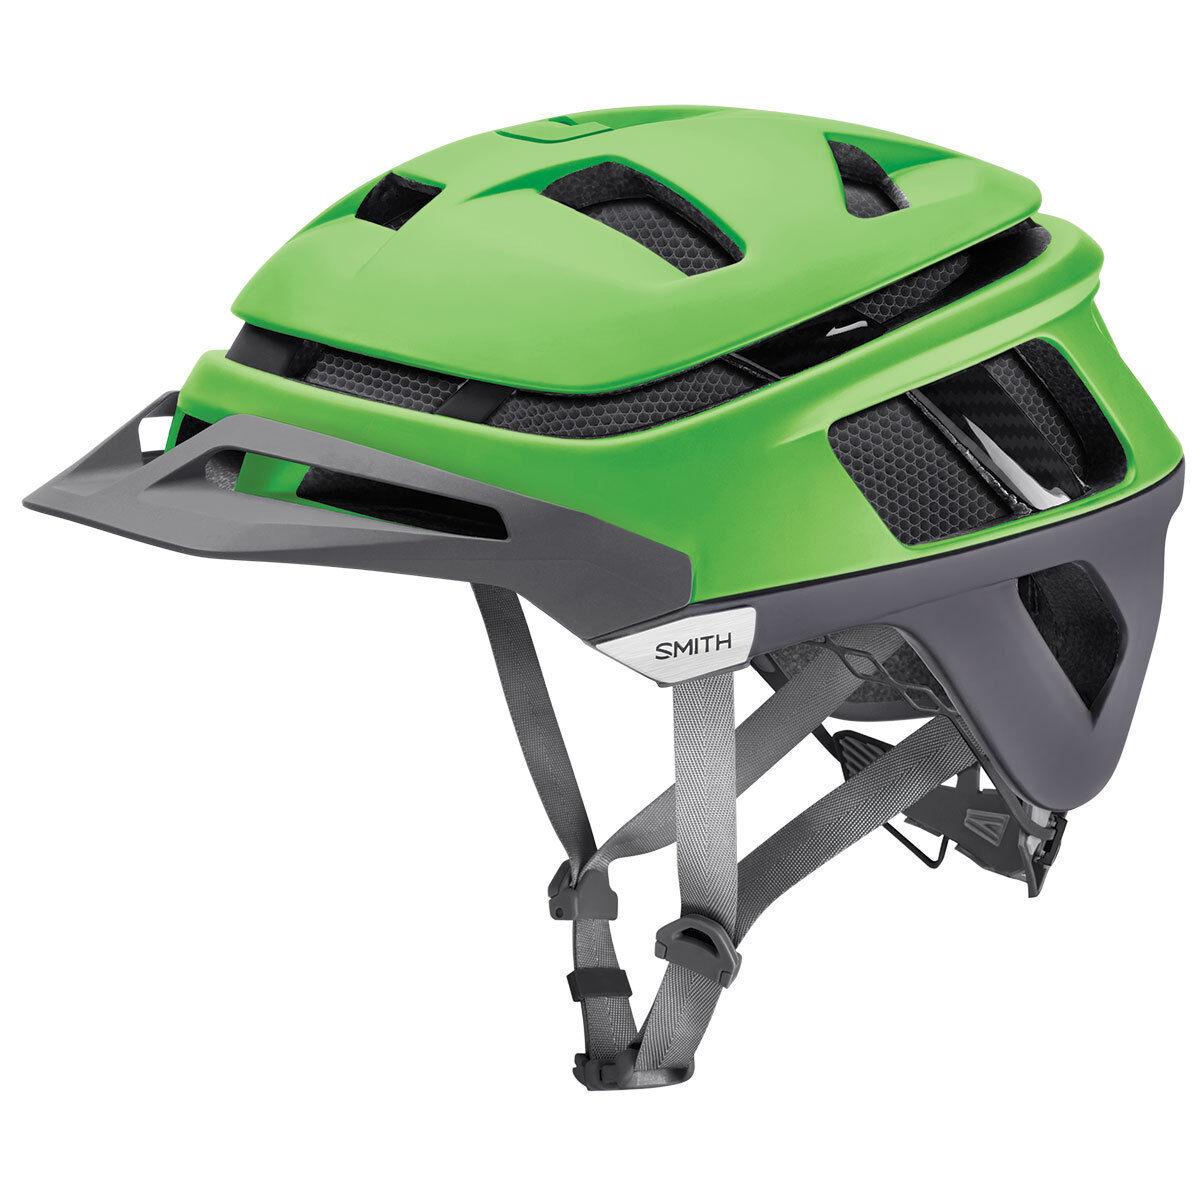 Smith Forefront Bicicletta MTB Casco verde Grigio W Koroyd S M L